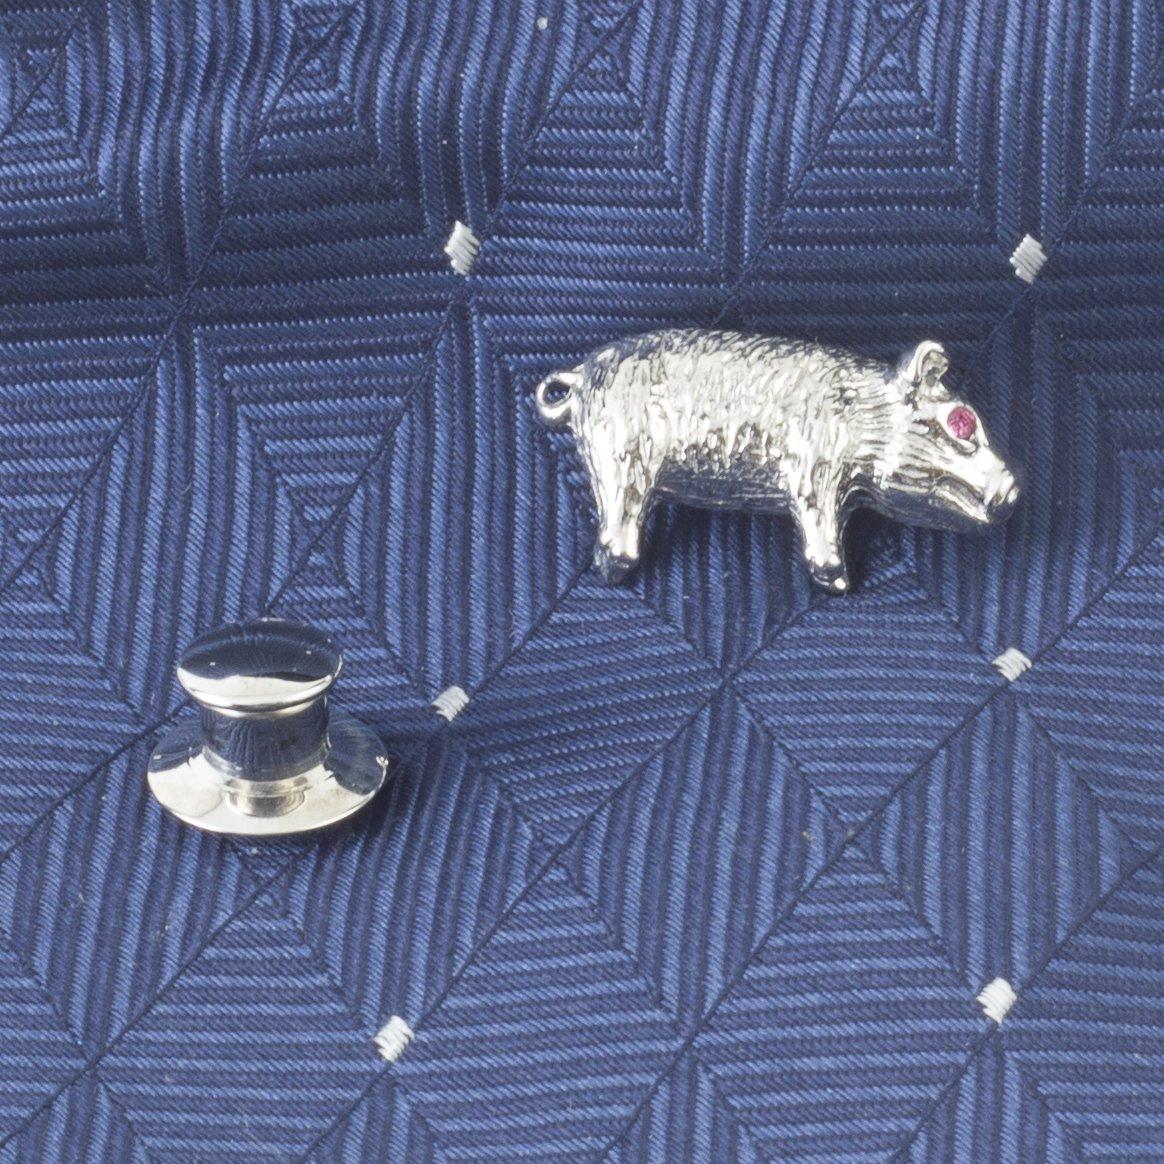 Tateossian Men's Rhodium Plated Red Swarovski Pig Tie Pin by Tateossian (Image #2)